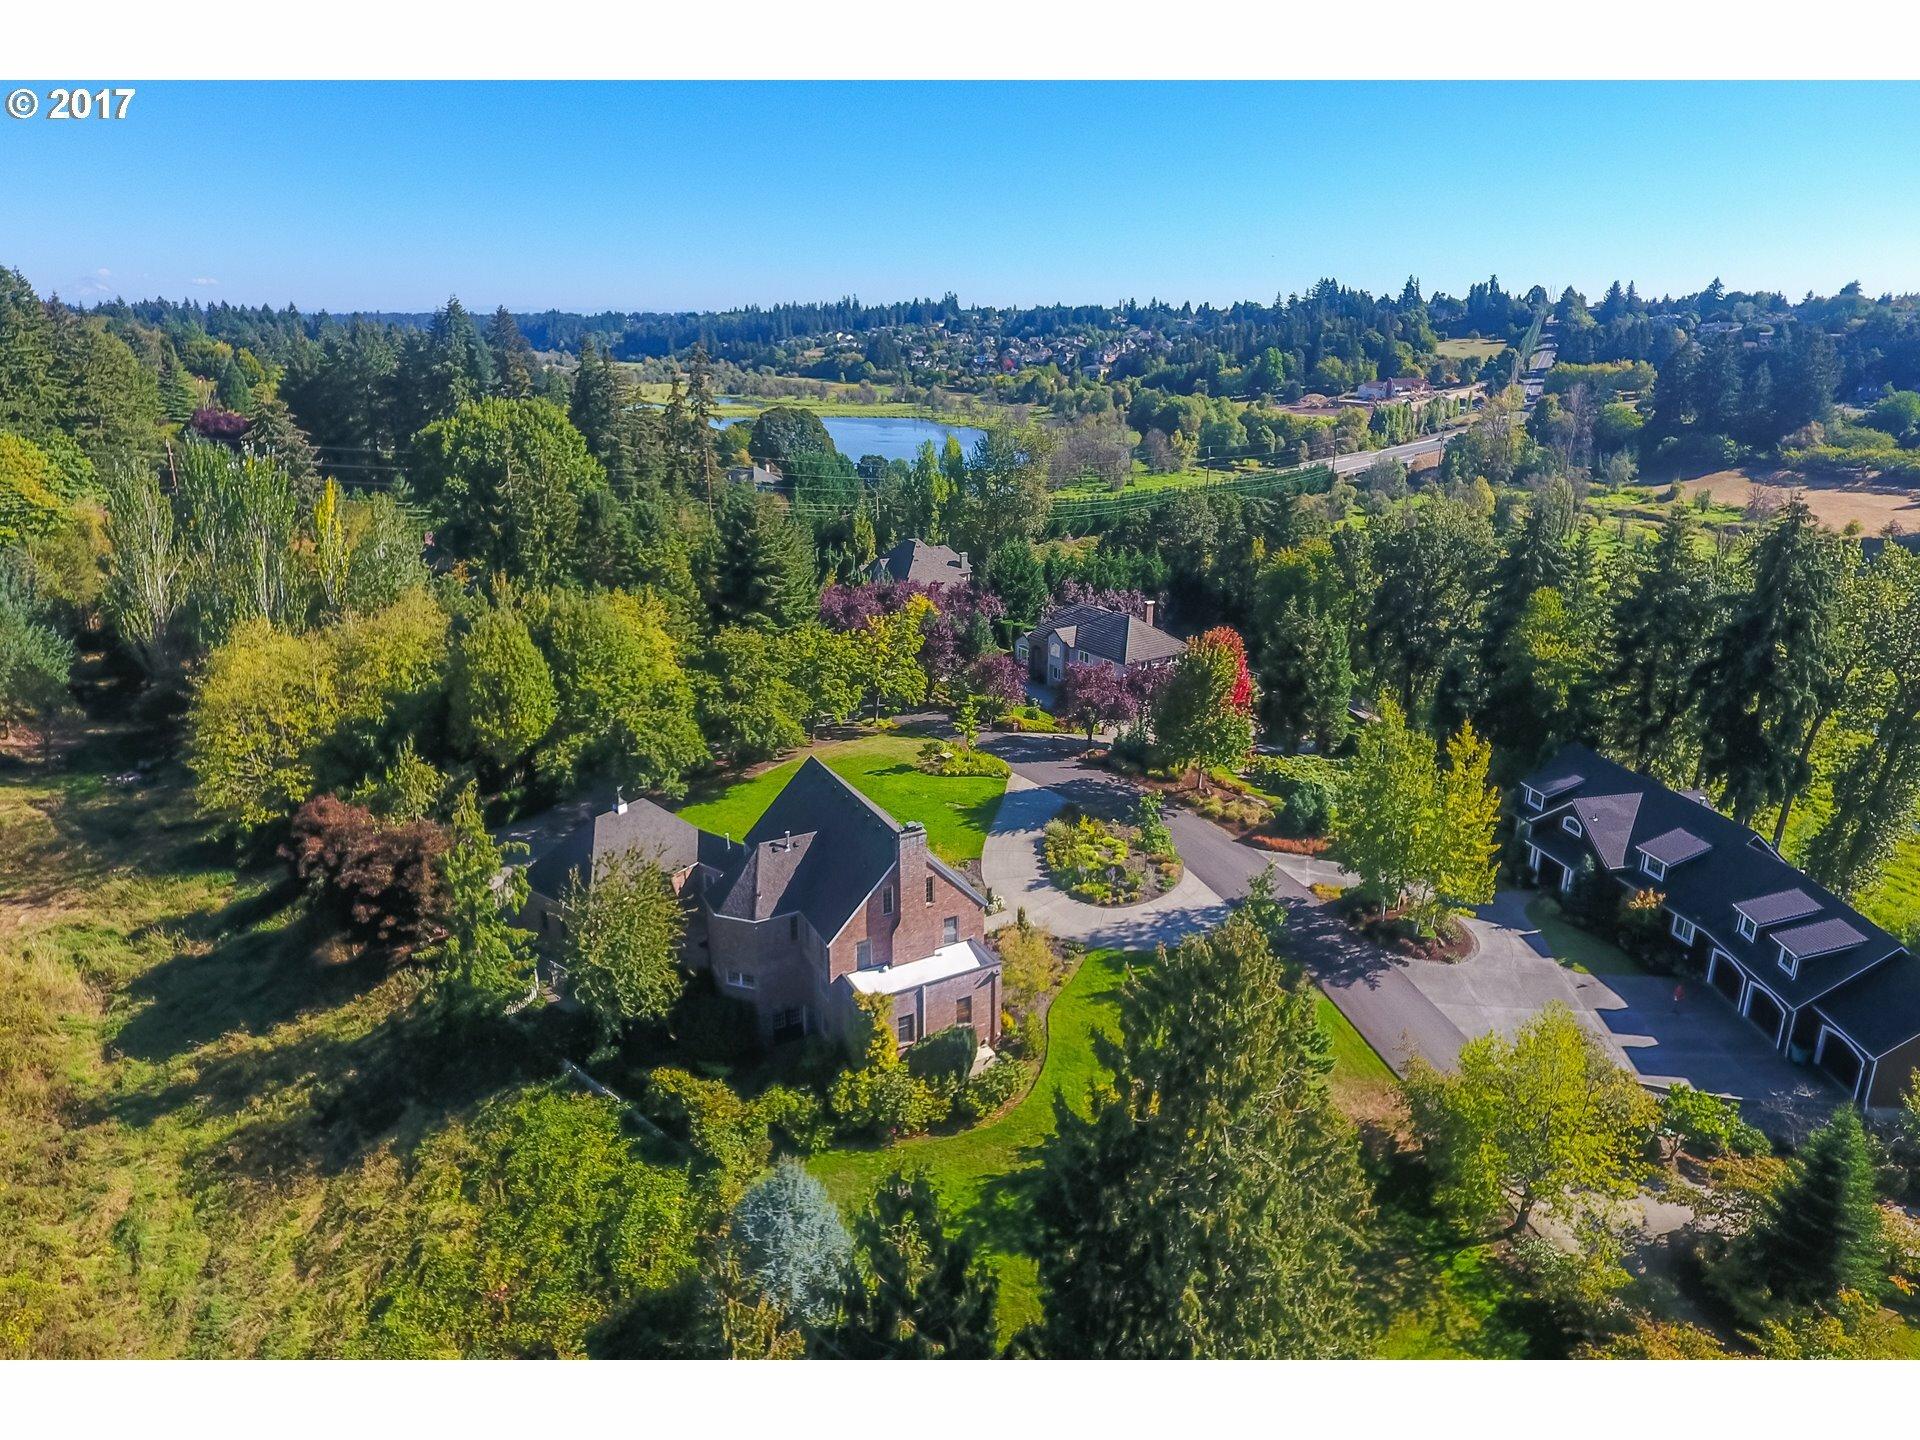 3618 Nw Bliss Rd, Vancouver, WA - USA (photo 2)